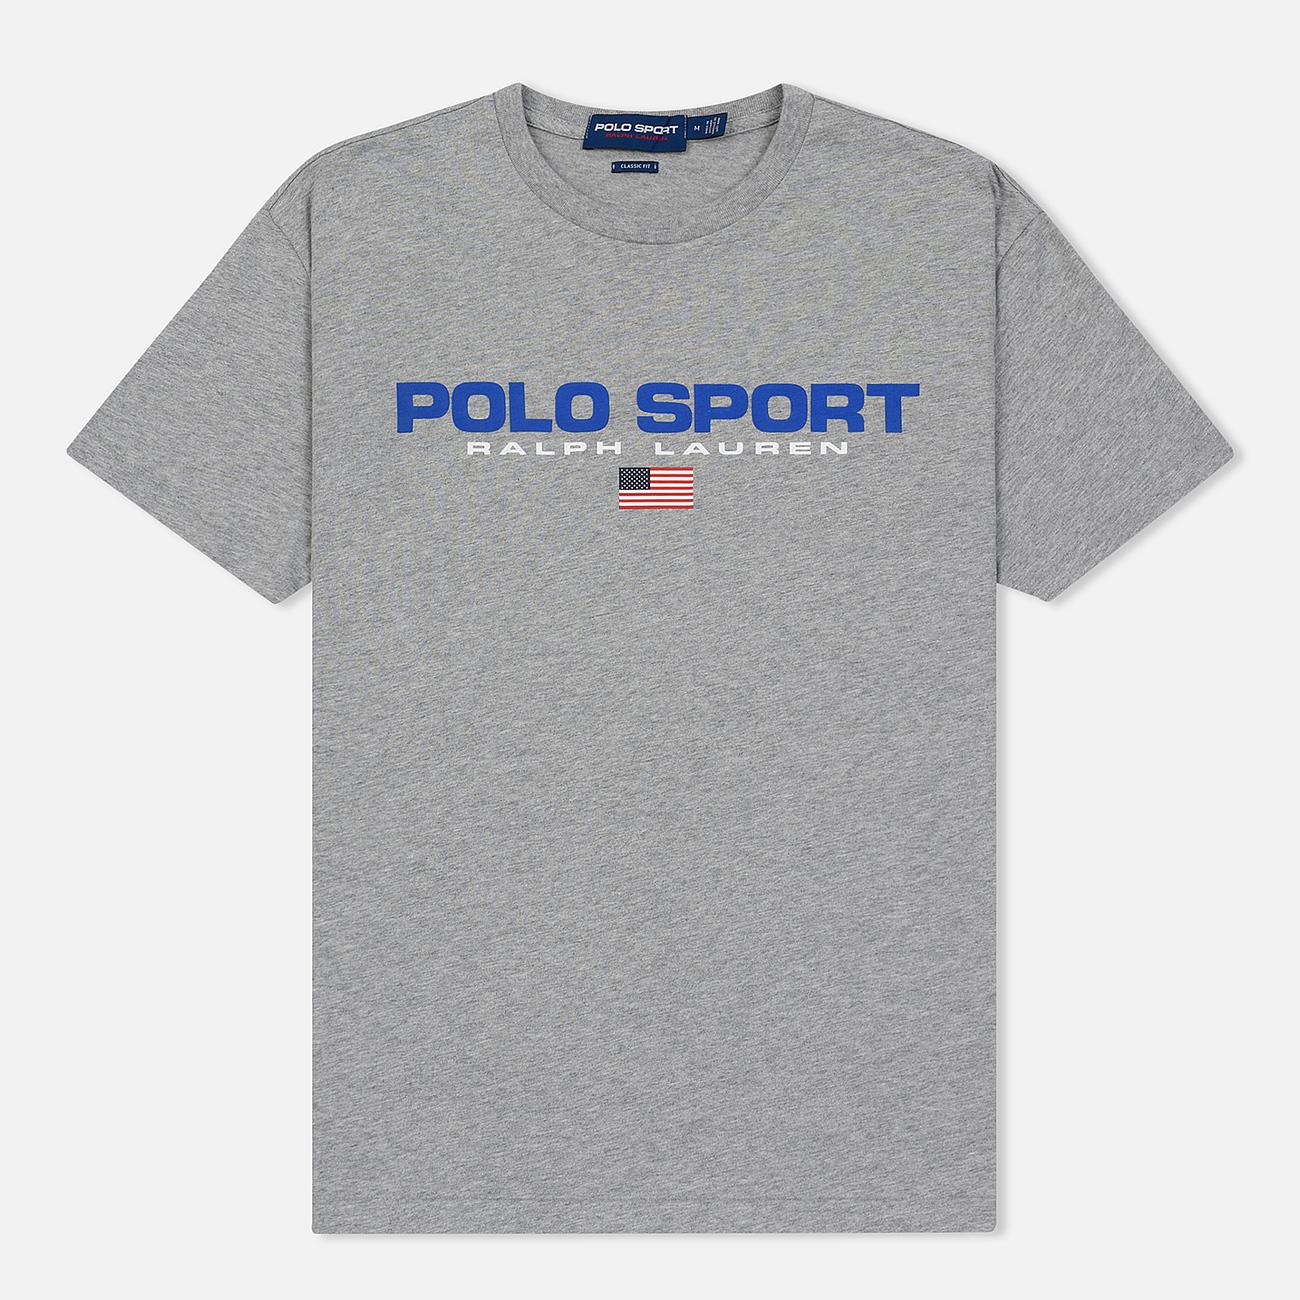 Мужская футболка Polo Ralph Lauren Polo Sport Andover Heather